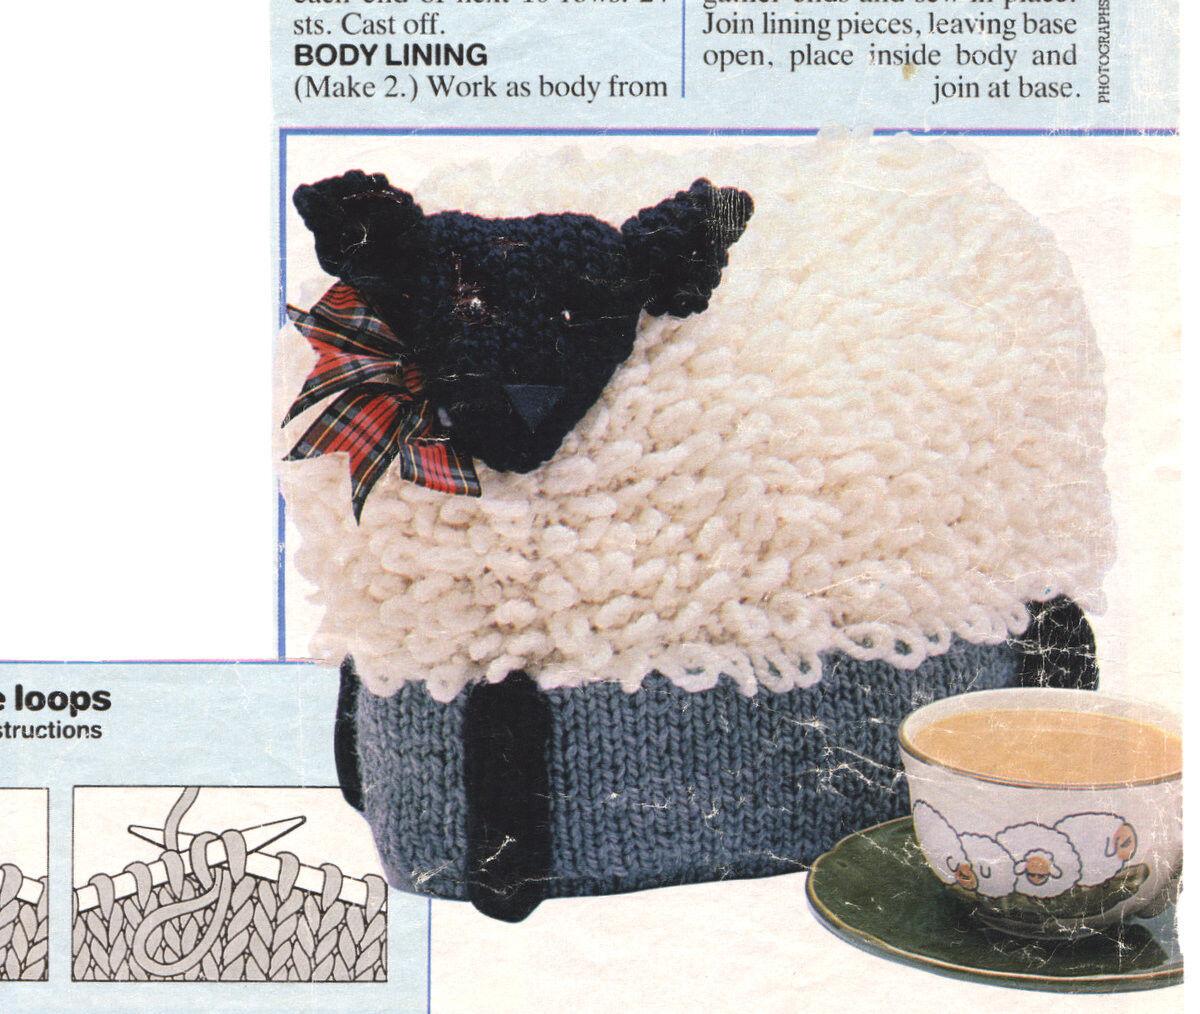 Tea cosy knitting patterns free australia dating